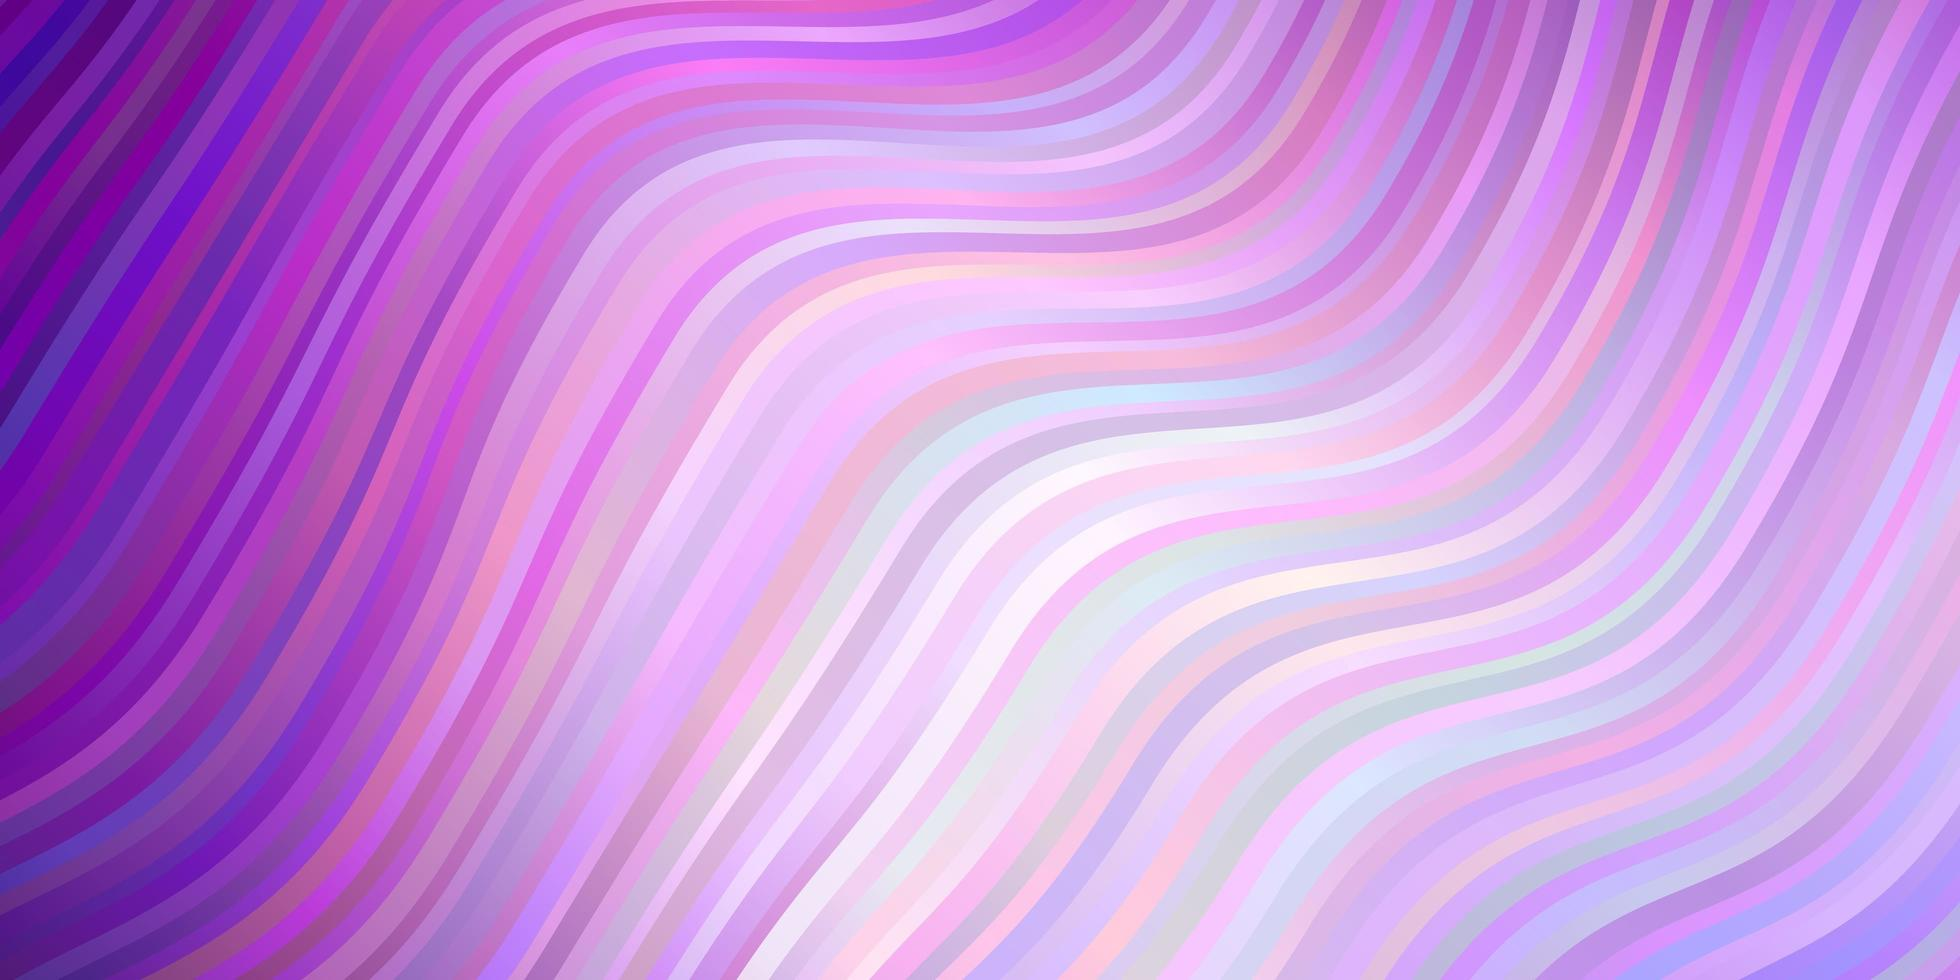 lichtpaarse vector achtergrond met curven.